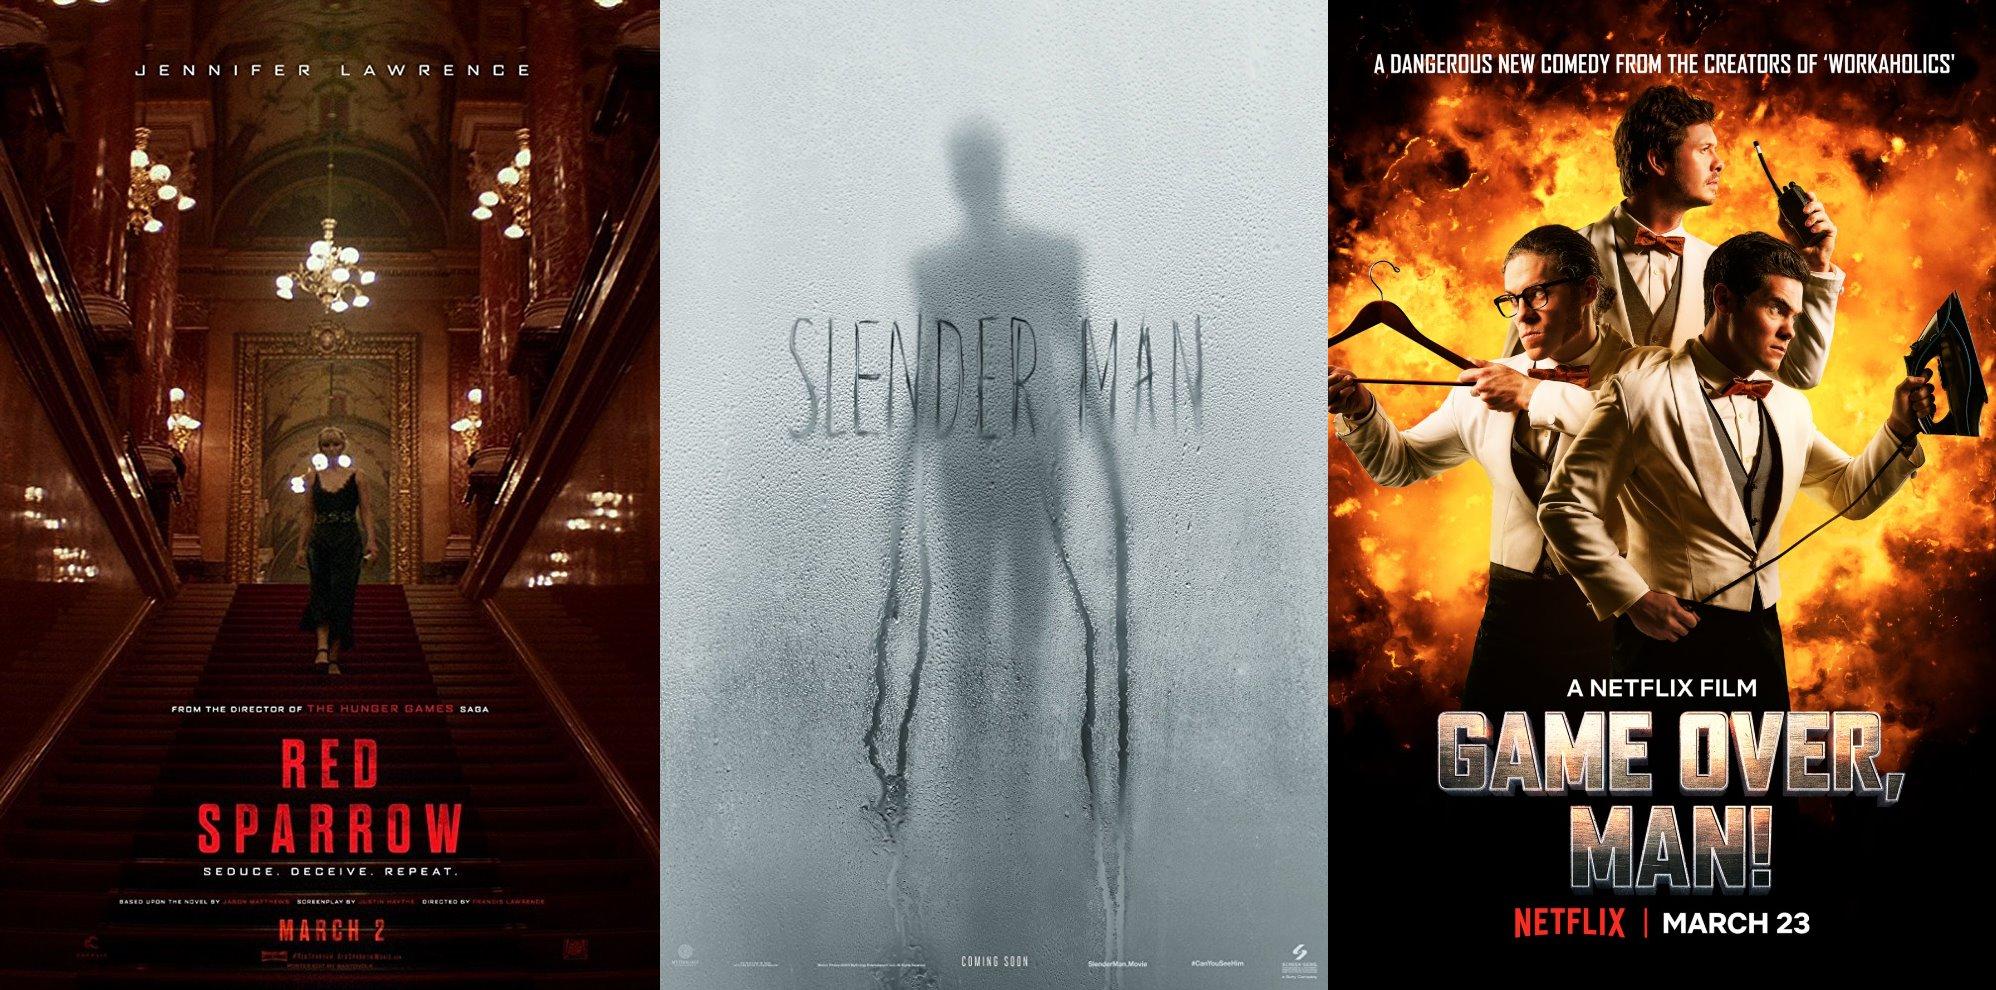 Trailer-Watchin' Wednesday: Red Sparrow, Game Over Man, Slender Man